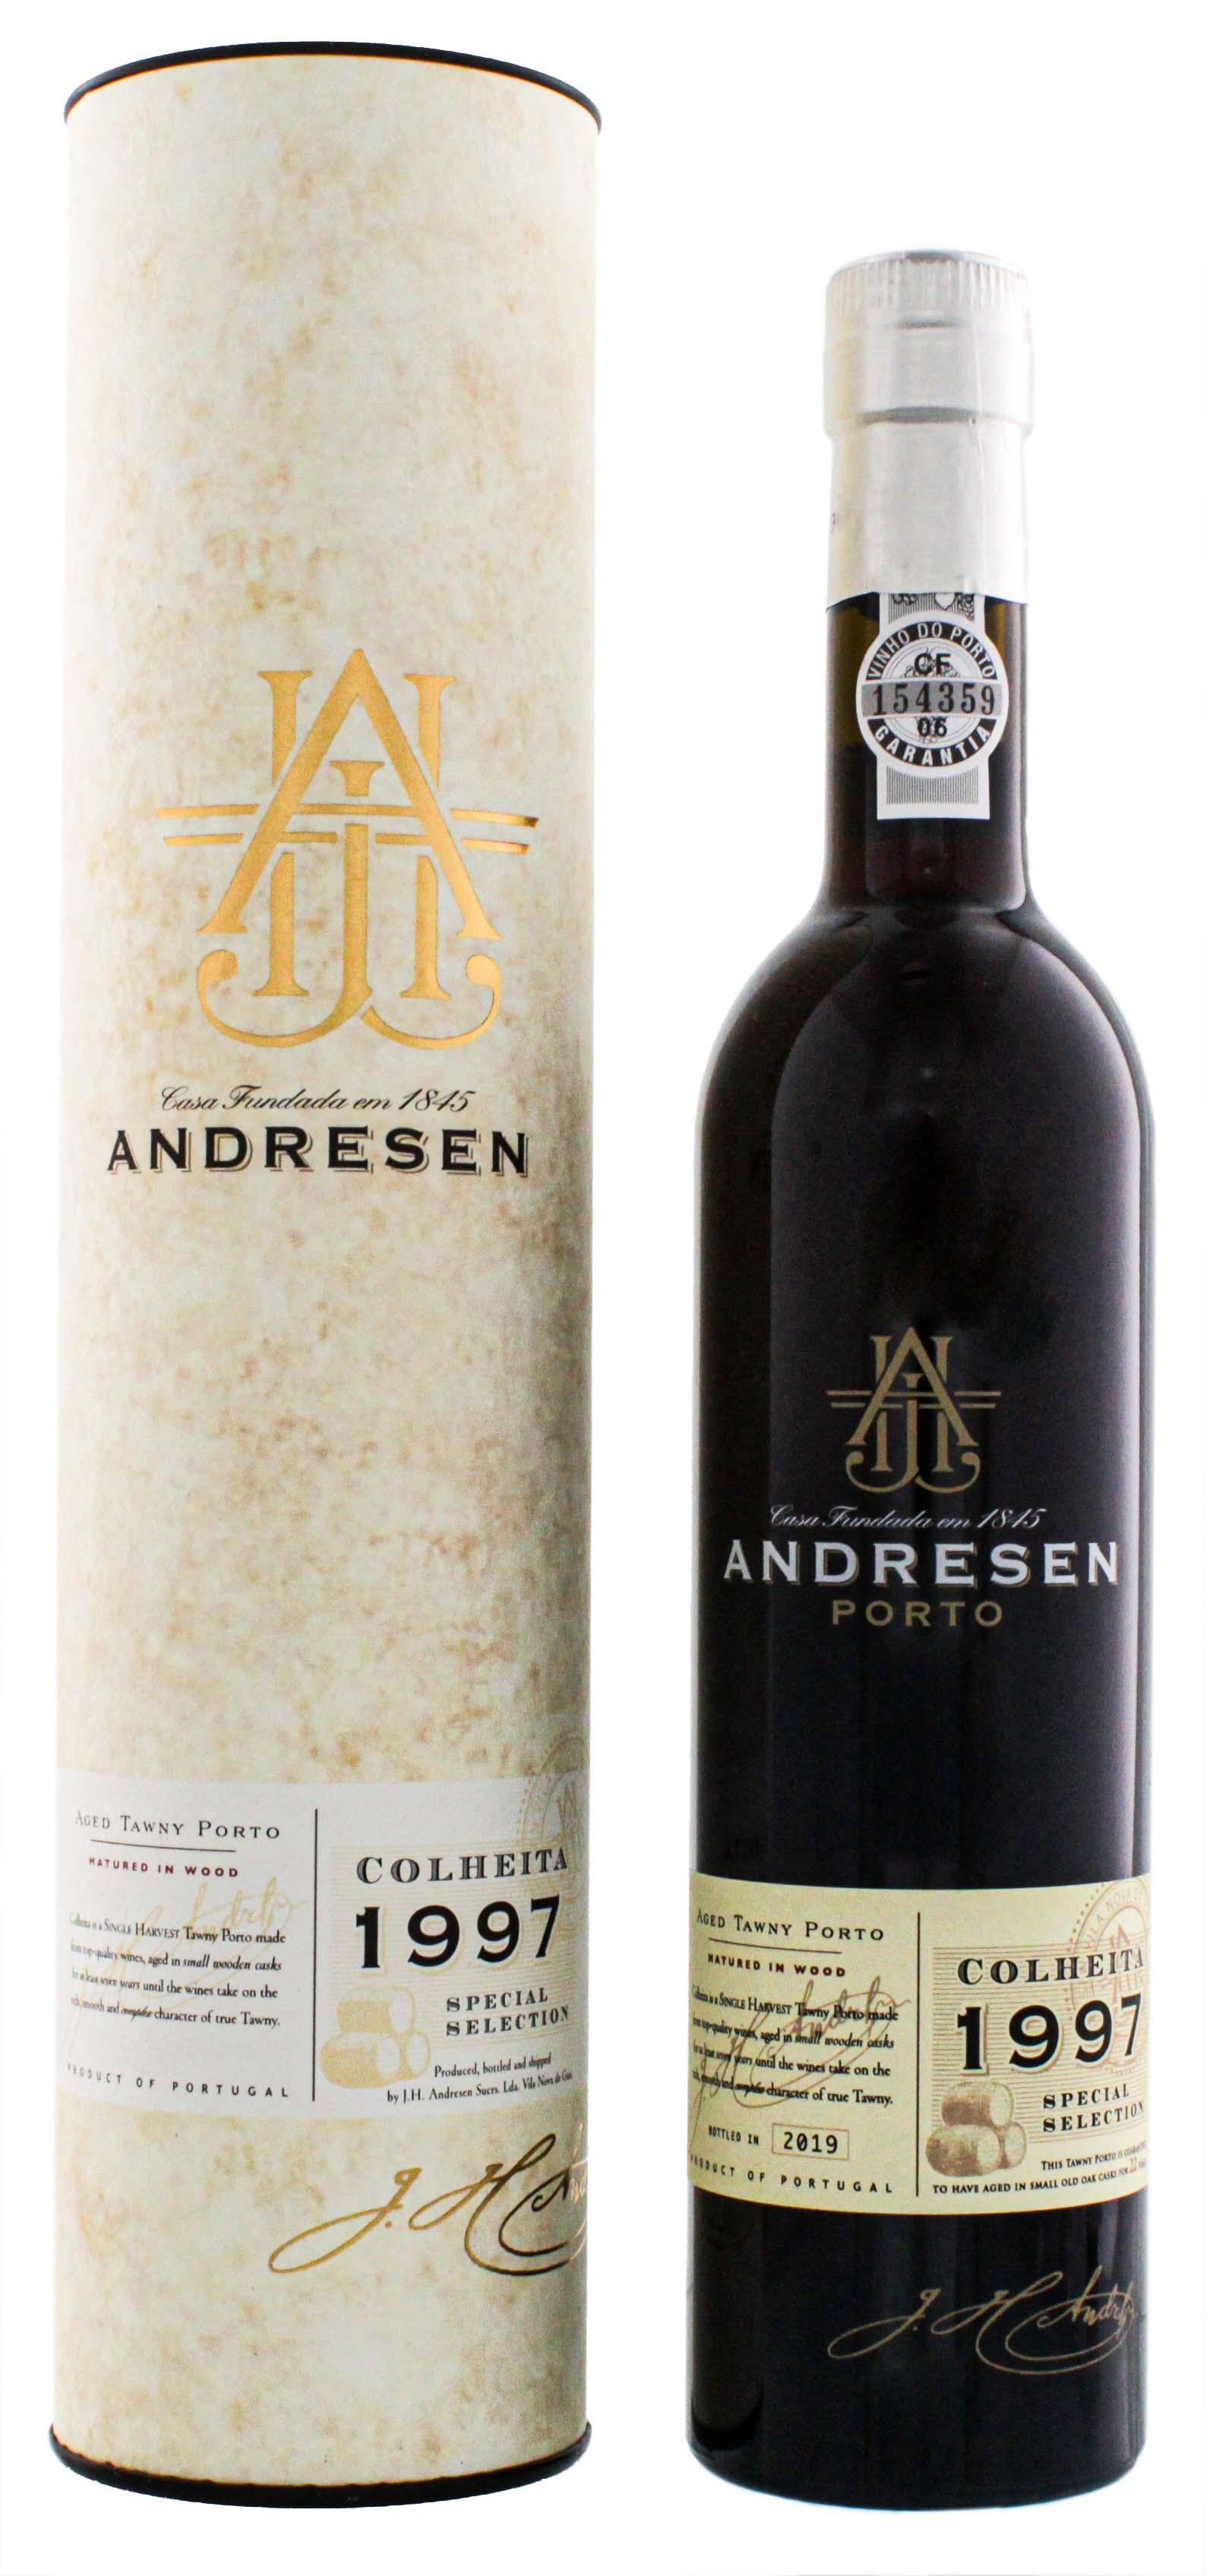 Andresen Colheita Port 1997/2019 Special Selection 0,5L